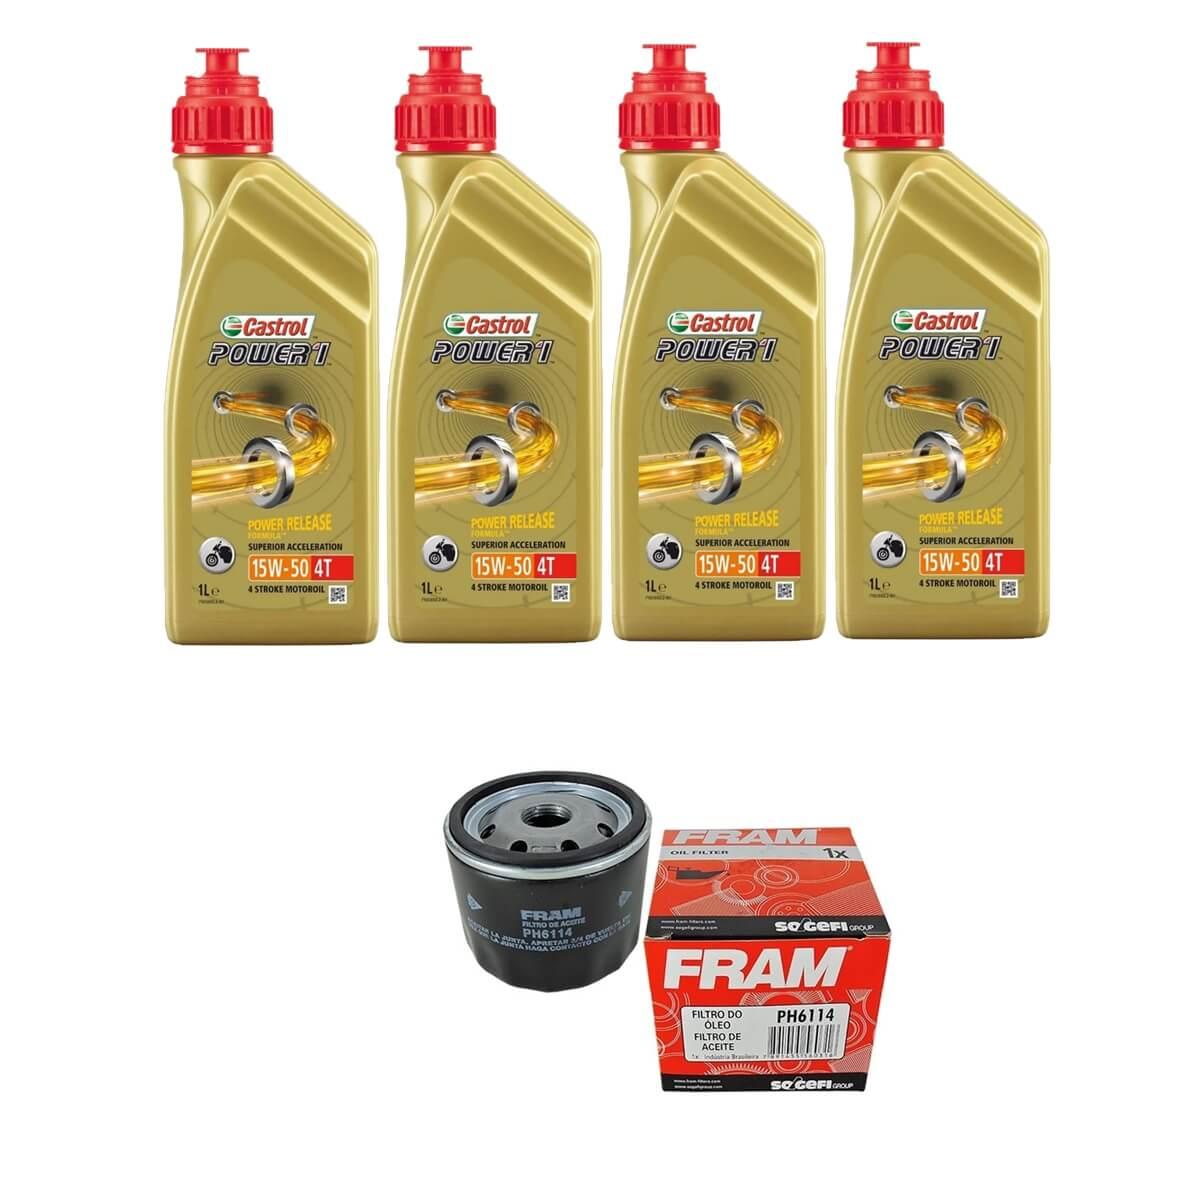 Kit Troca de Oleo Castrol Power 1 15w50 4lt + Filtro Fram PH6114